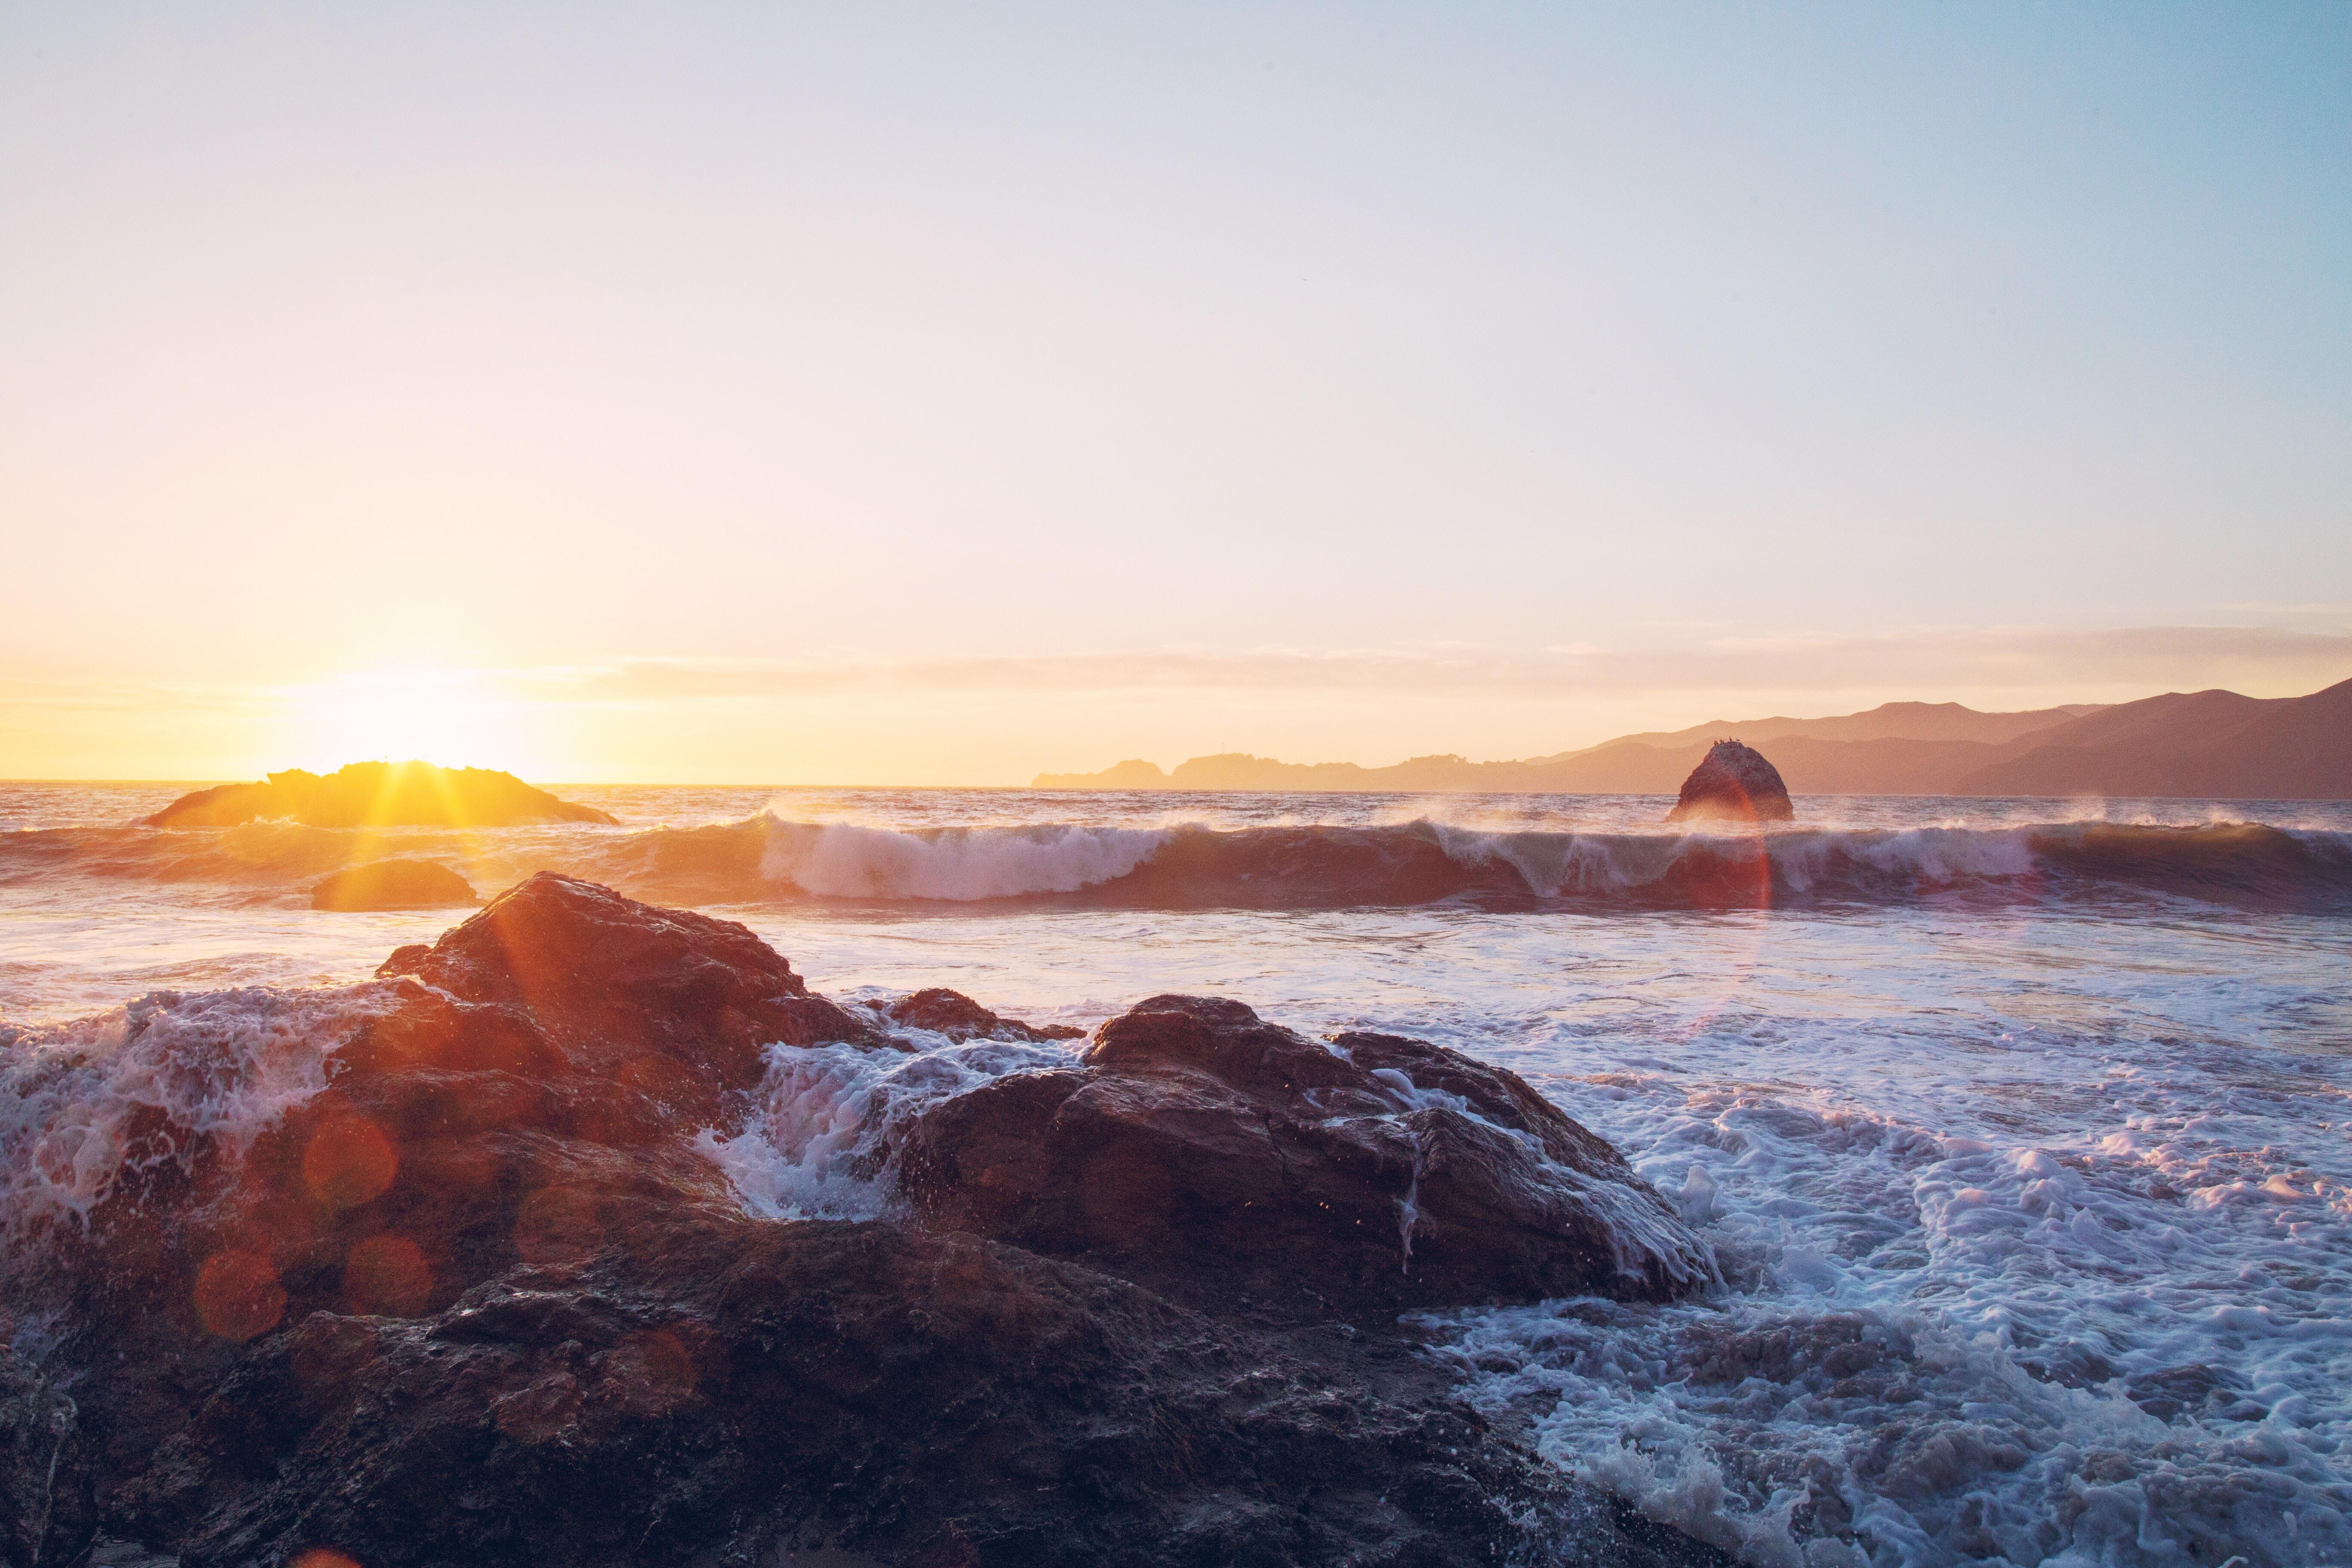 White sea waves hitting against rocks near the shore during sunset